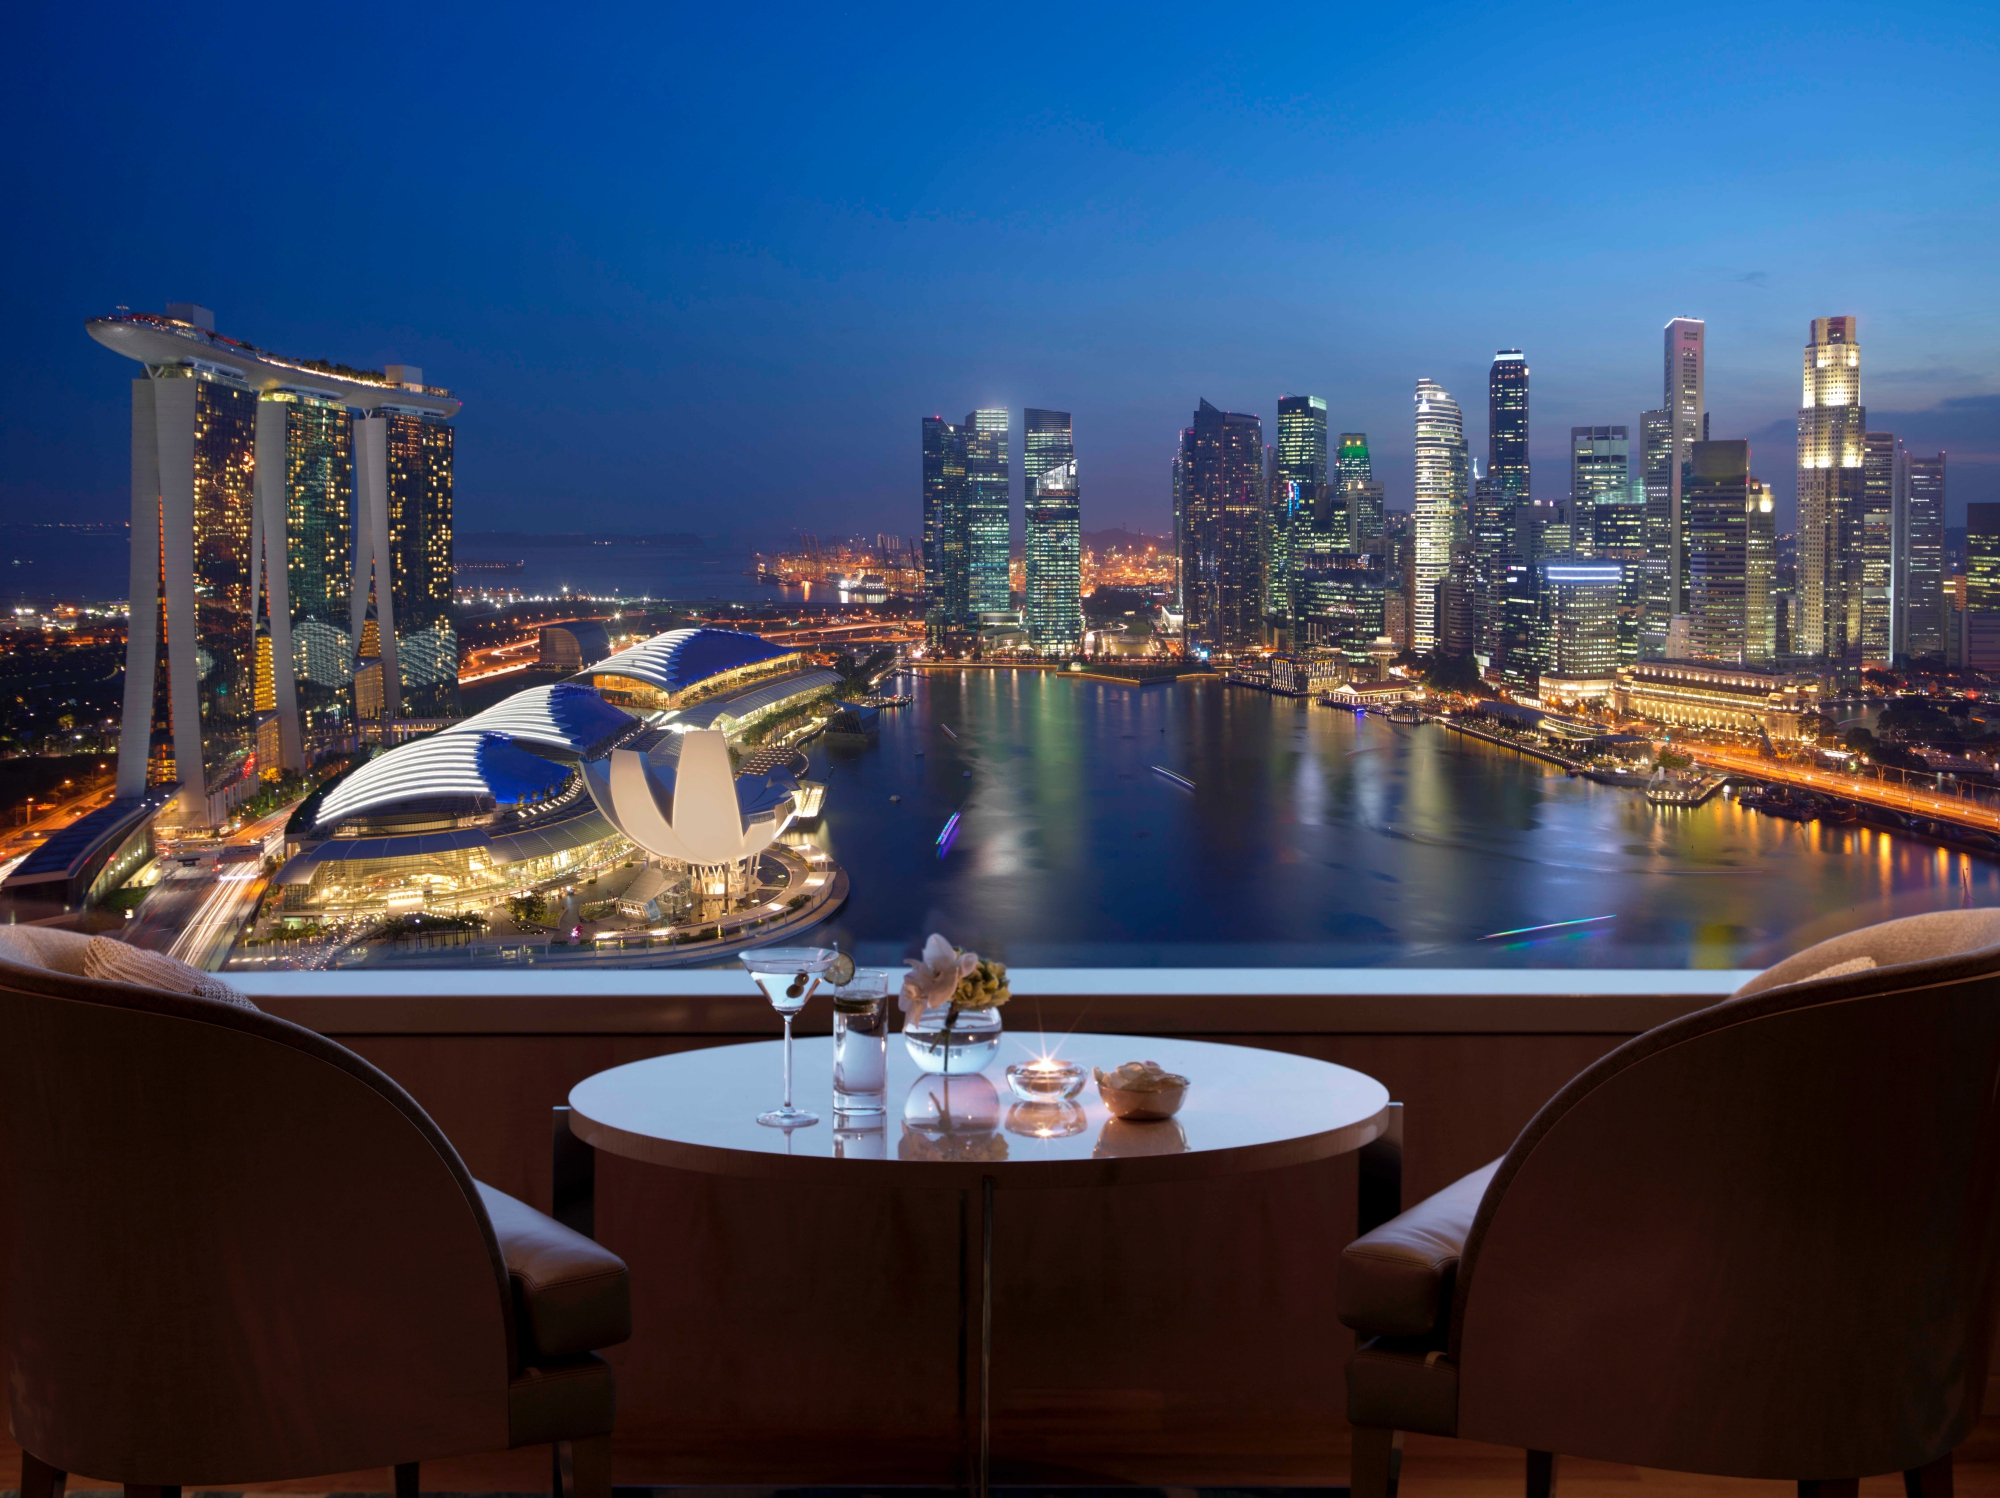 The Ritz-Carlton, Millenia Singapore canvas of views